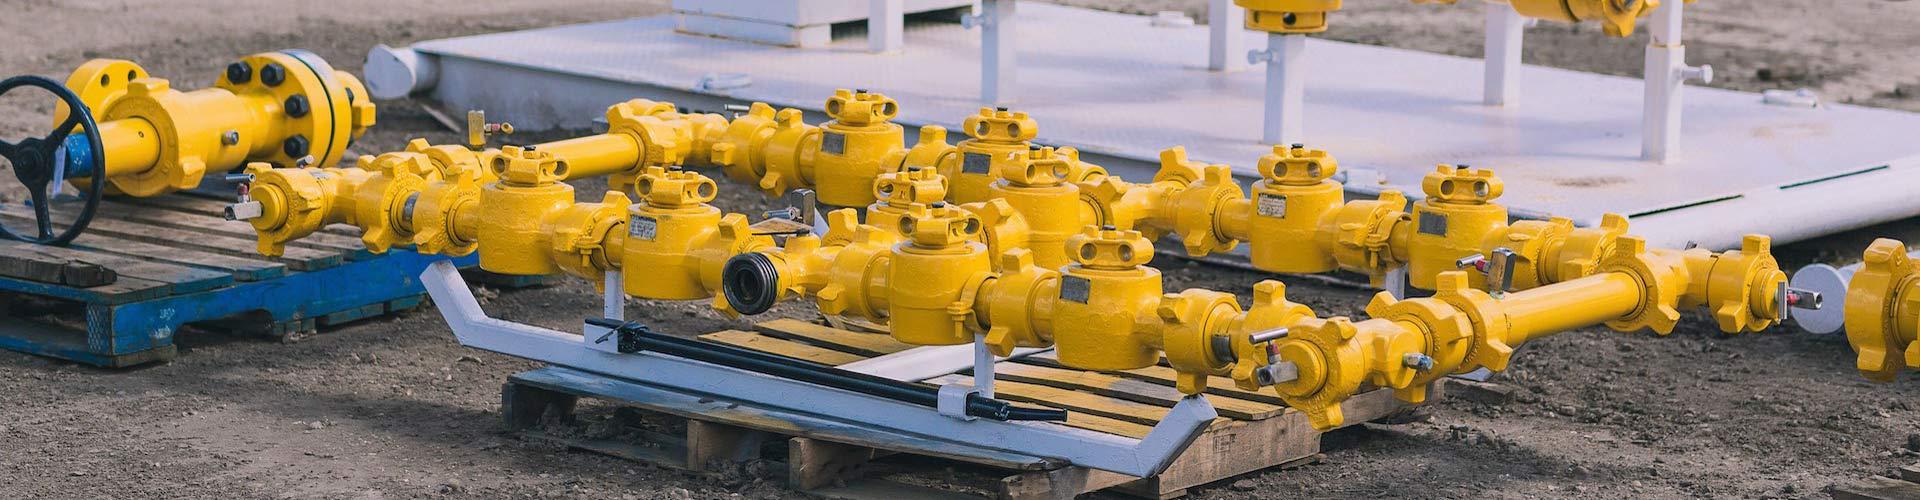 manifolds, oilfield manifolds